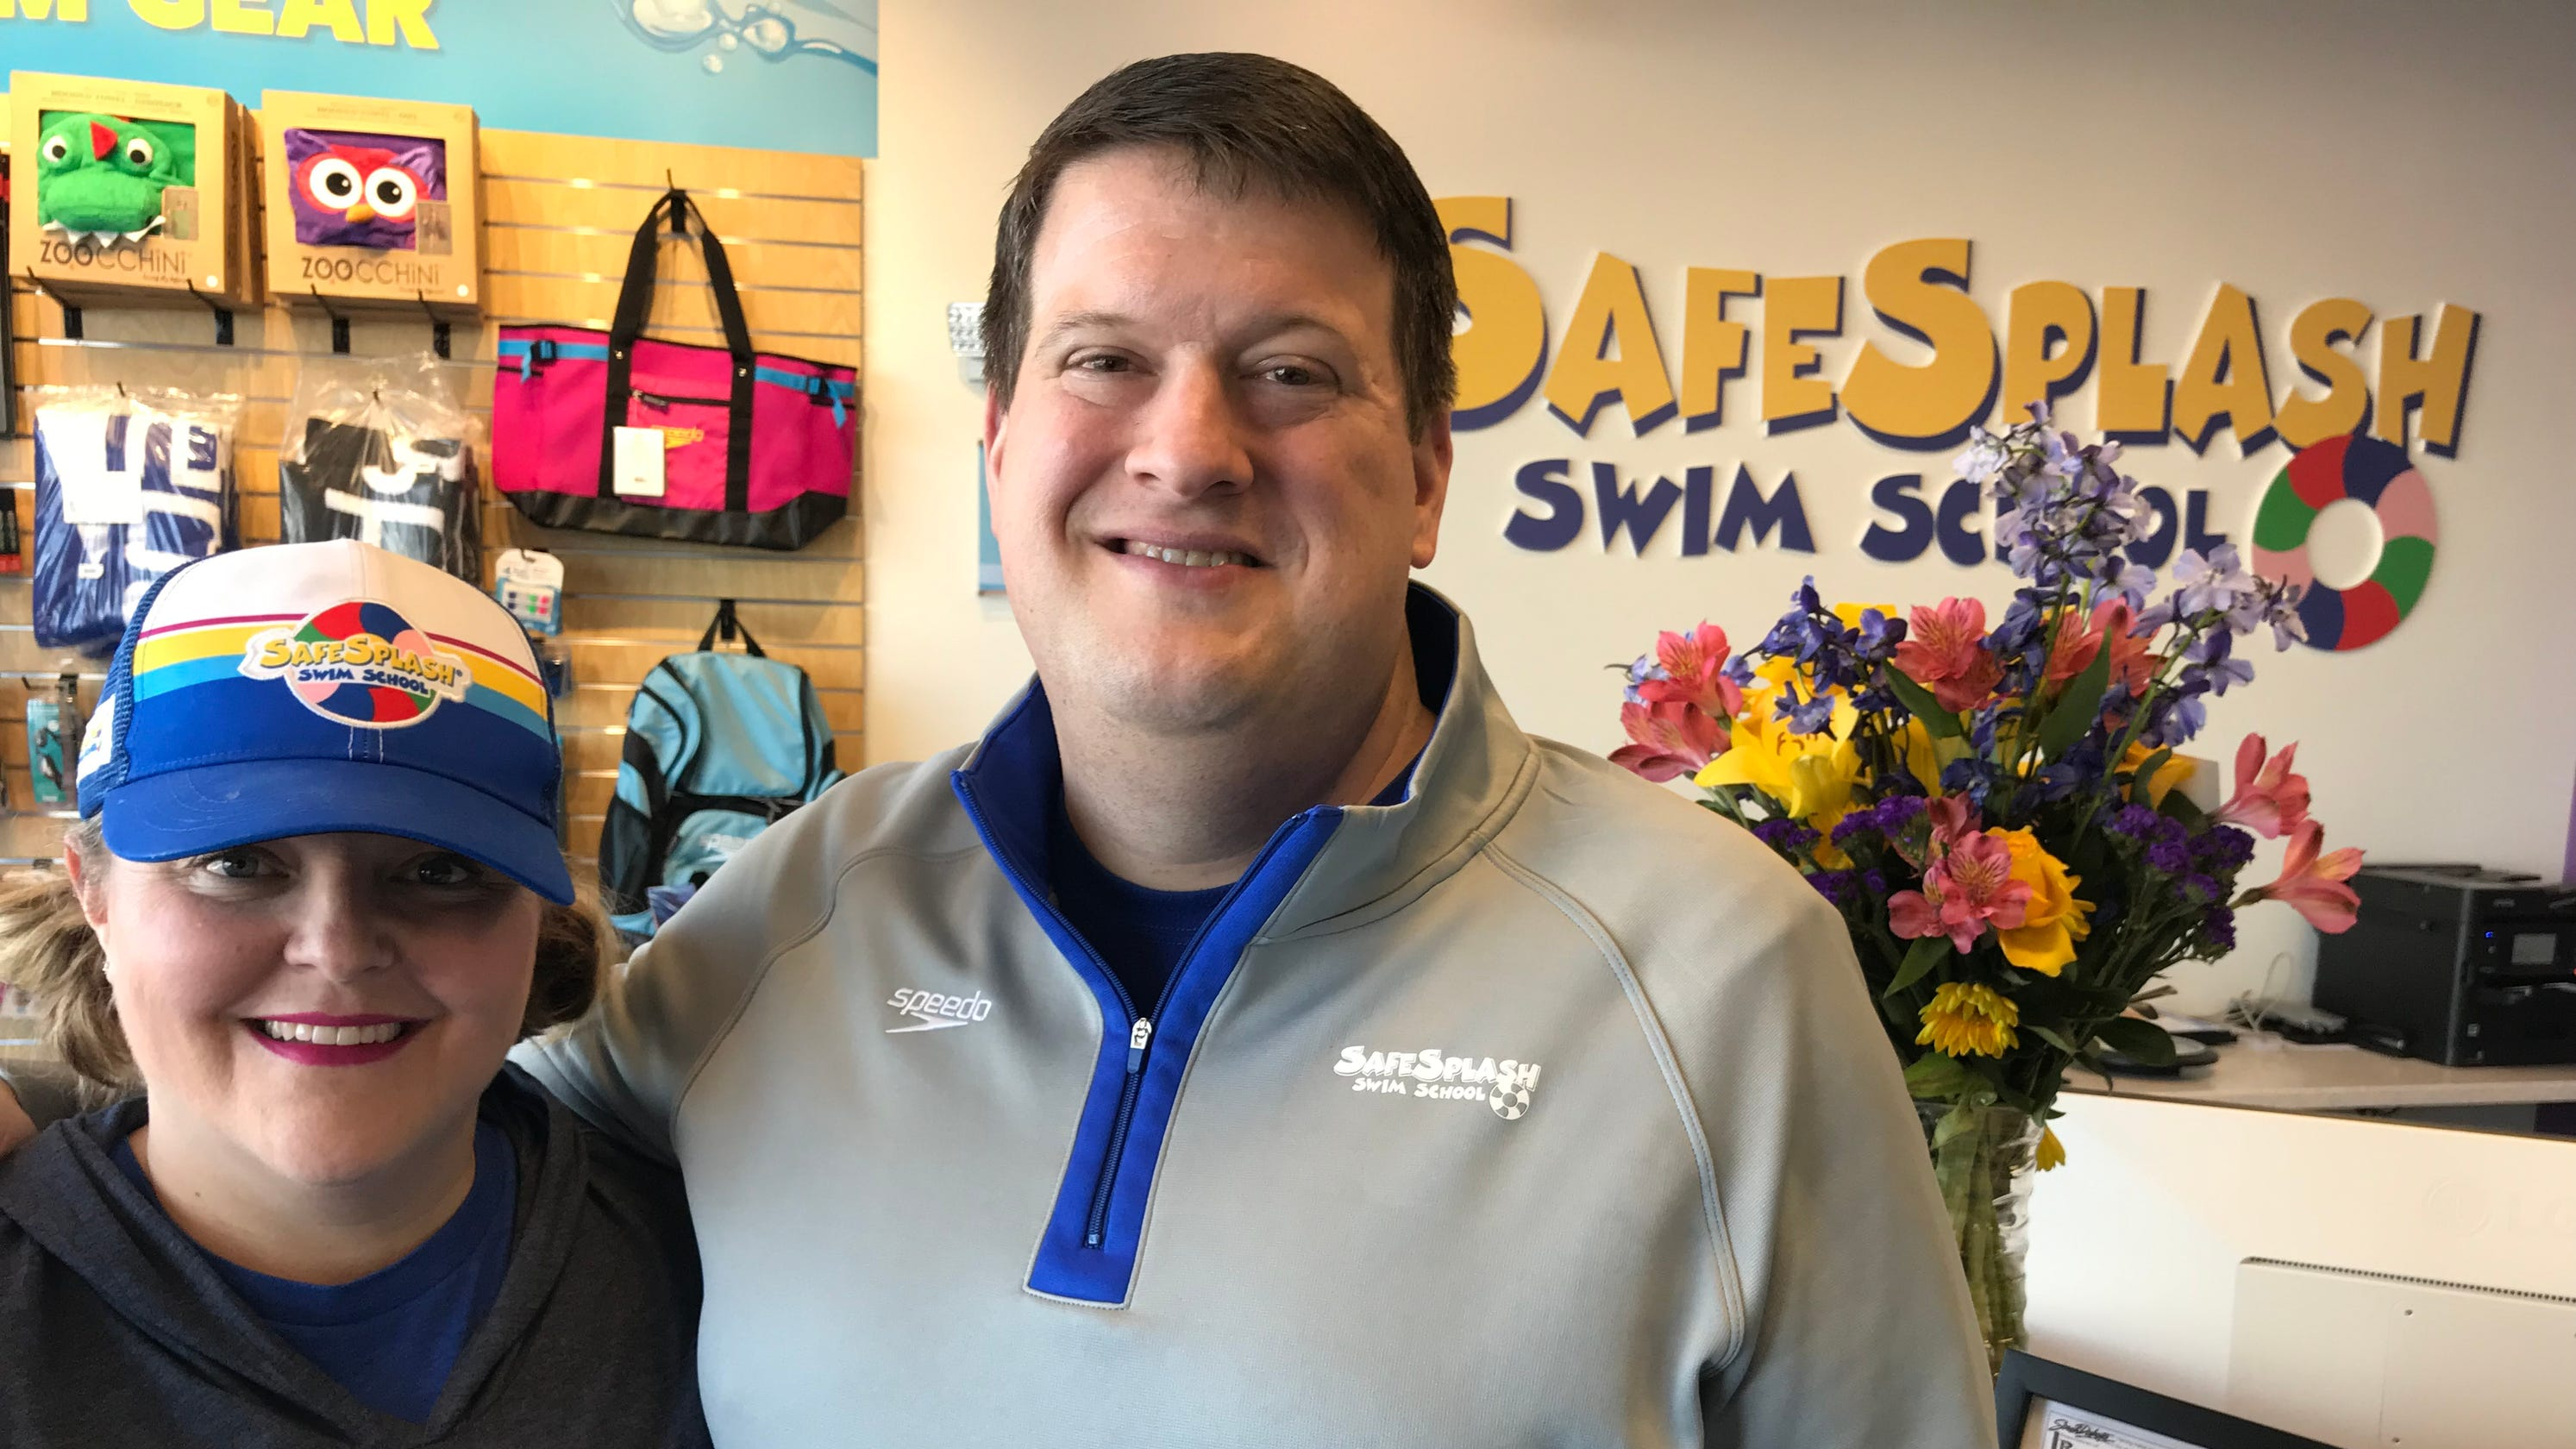 Wellness Center Swimming Lessons | Sanford Health